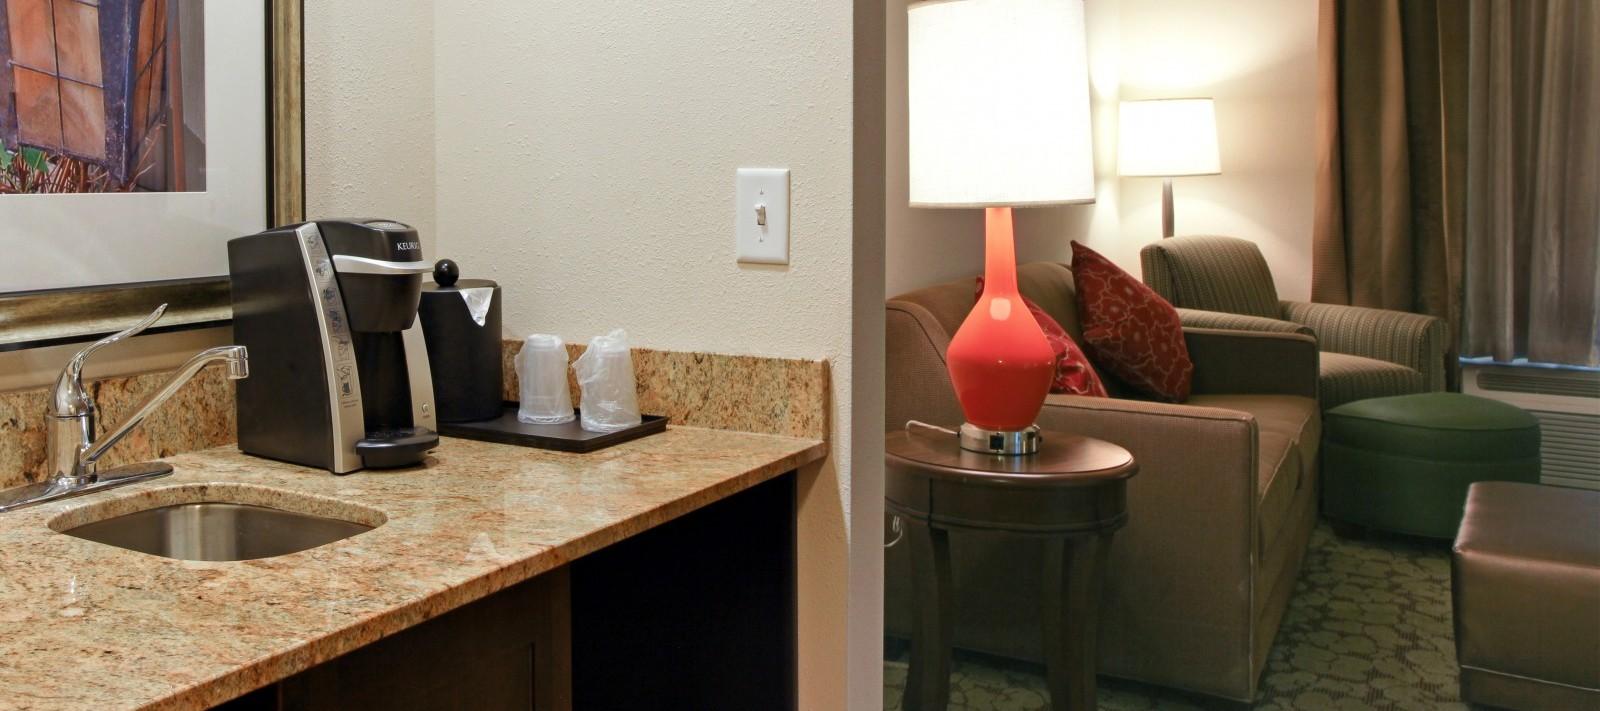 HIlton hotel room sink